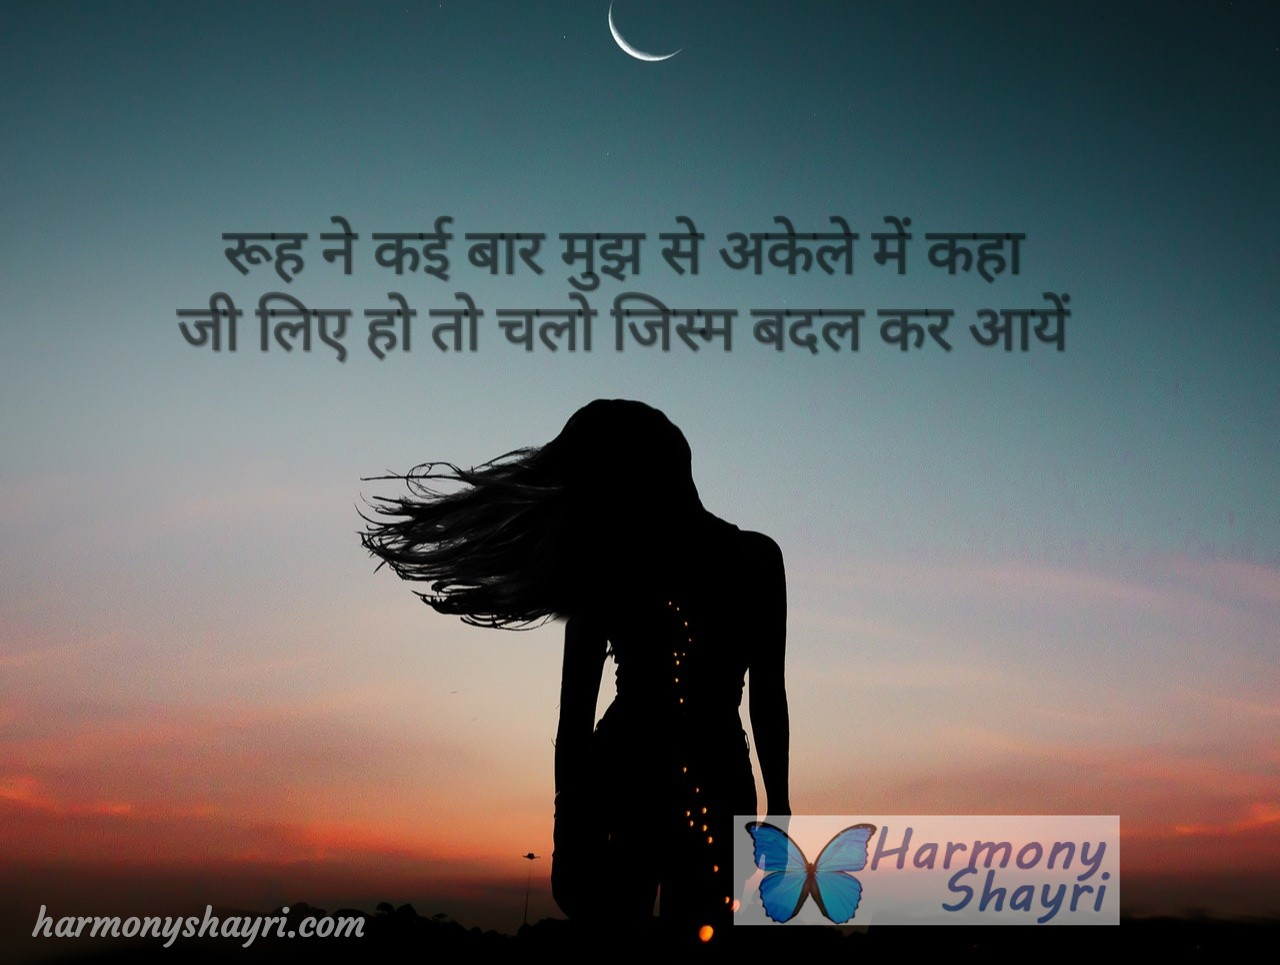 Rooh ne kai baar mujh se akele - Top Hindi Shayari